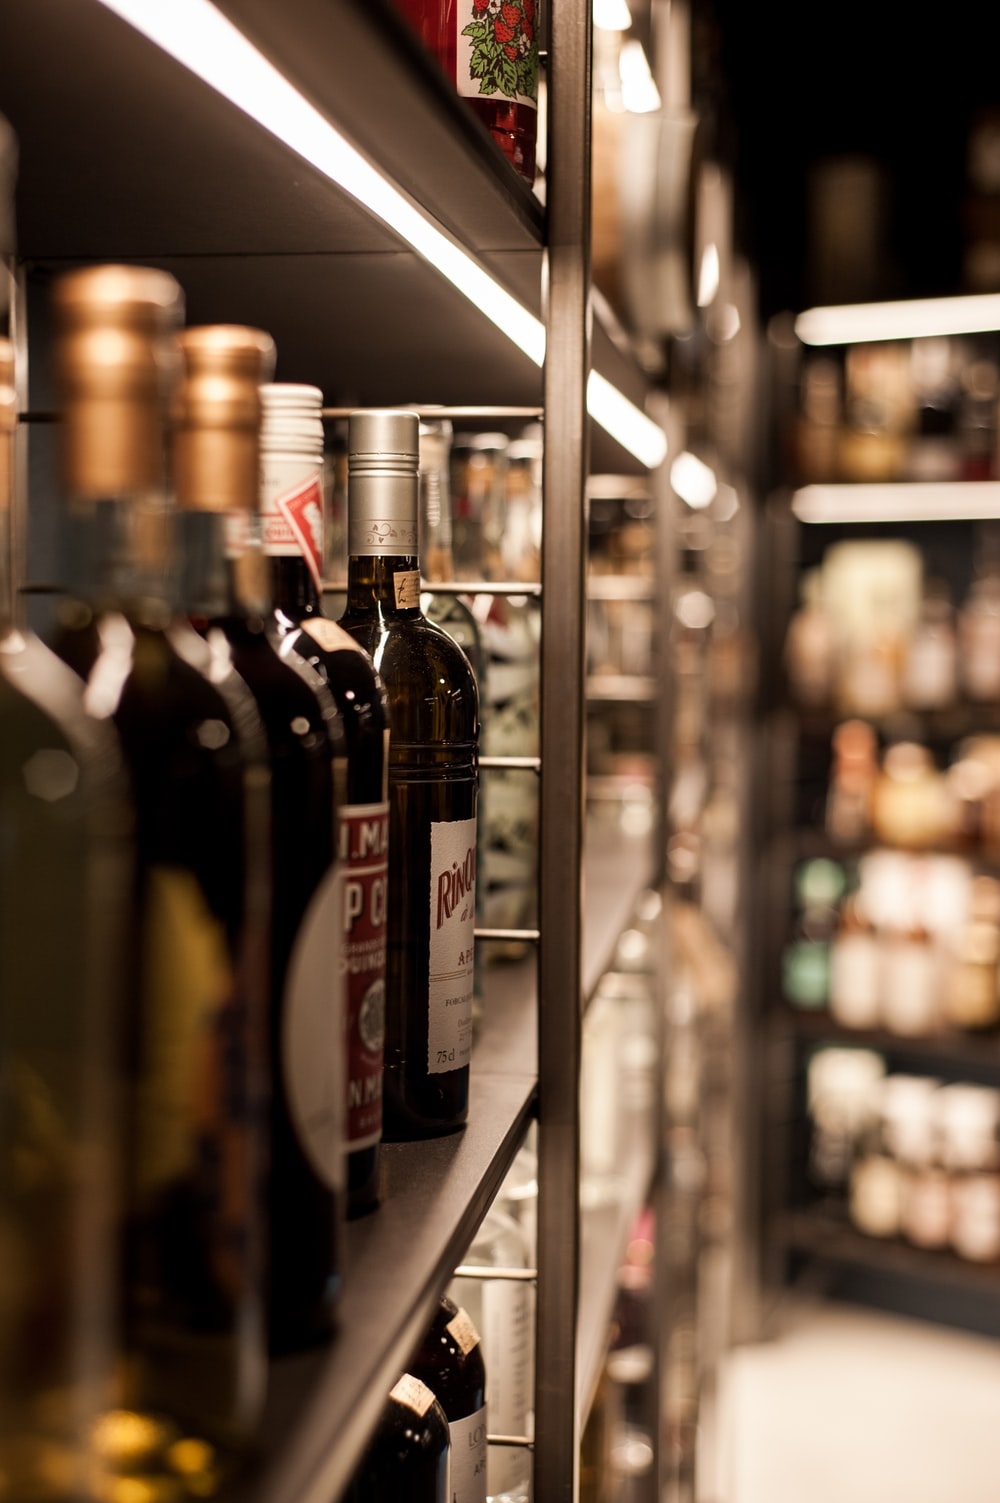 assorted wine bottles display on gray rack